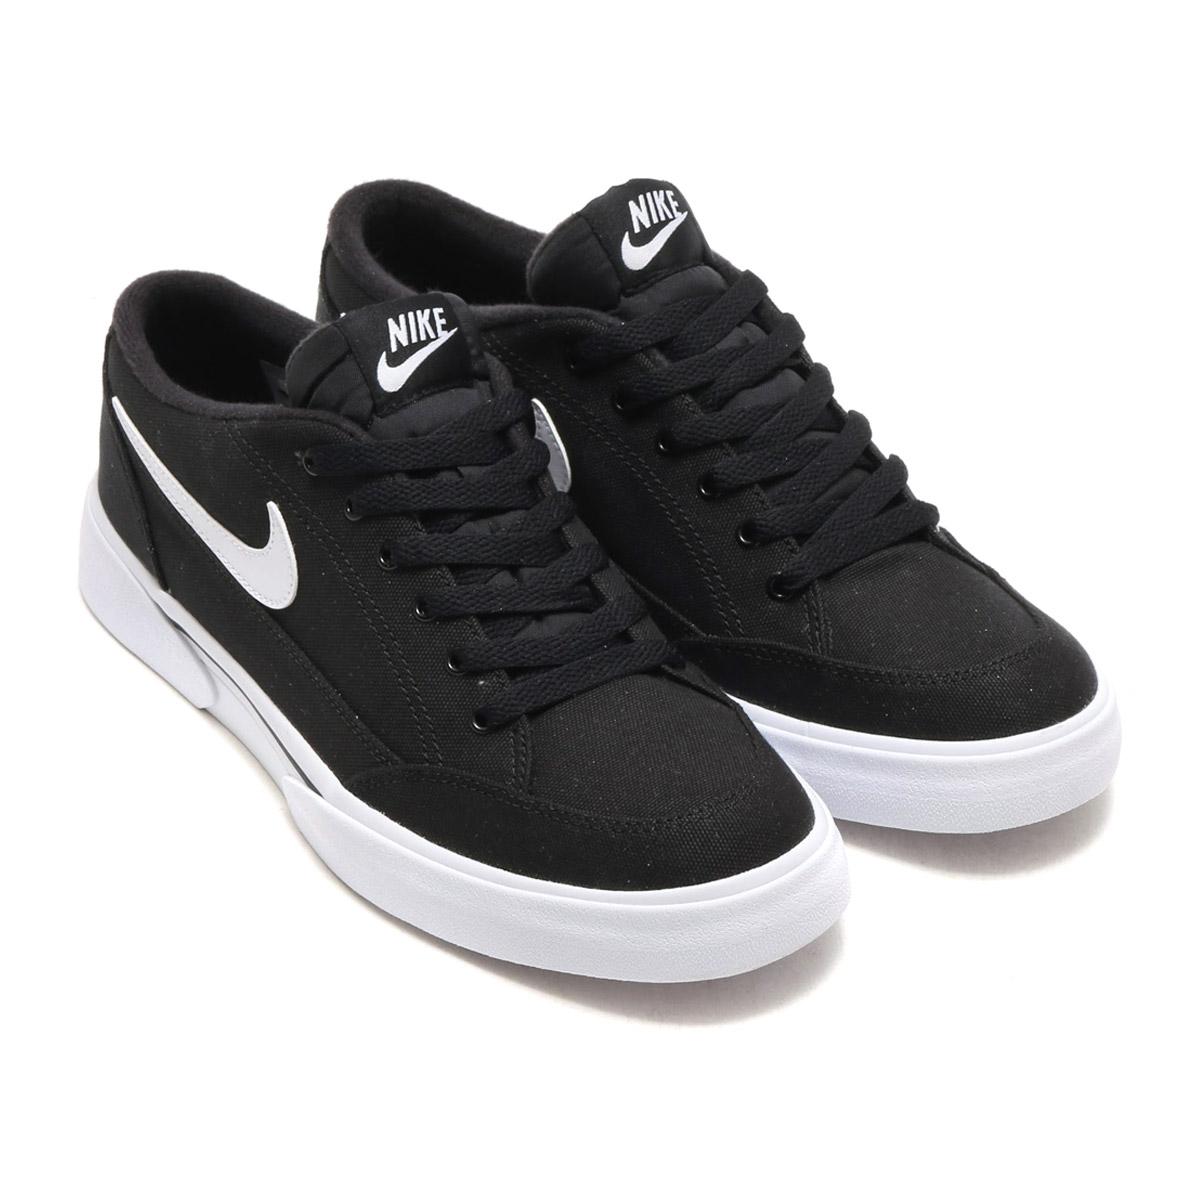 atmos-tokyo  NIKE GTS   16 TXT (Nike GTS 16 textile) BLACK WHITE ... 4c9cb10e1f